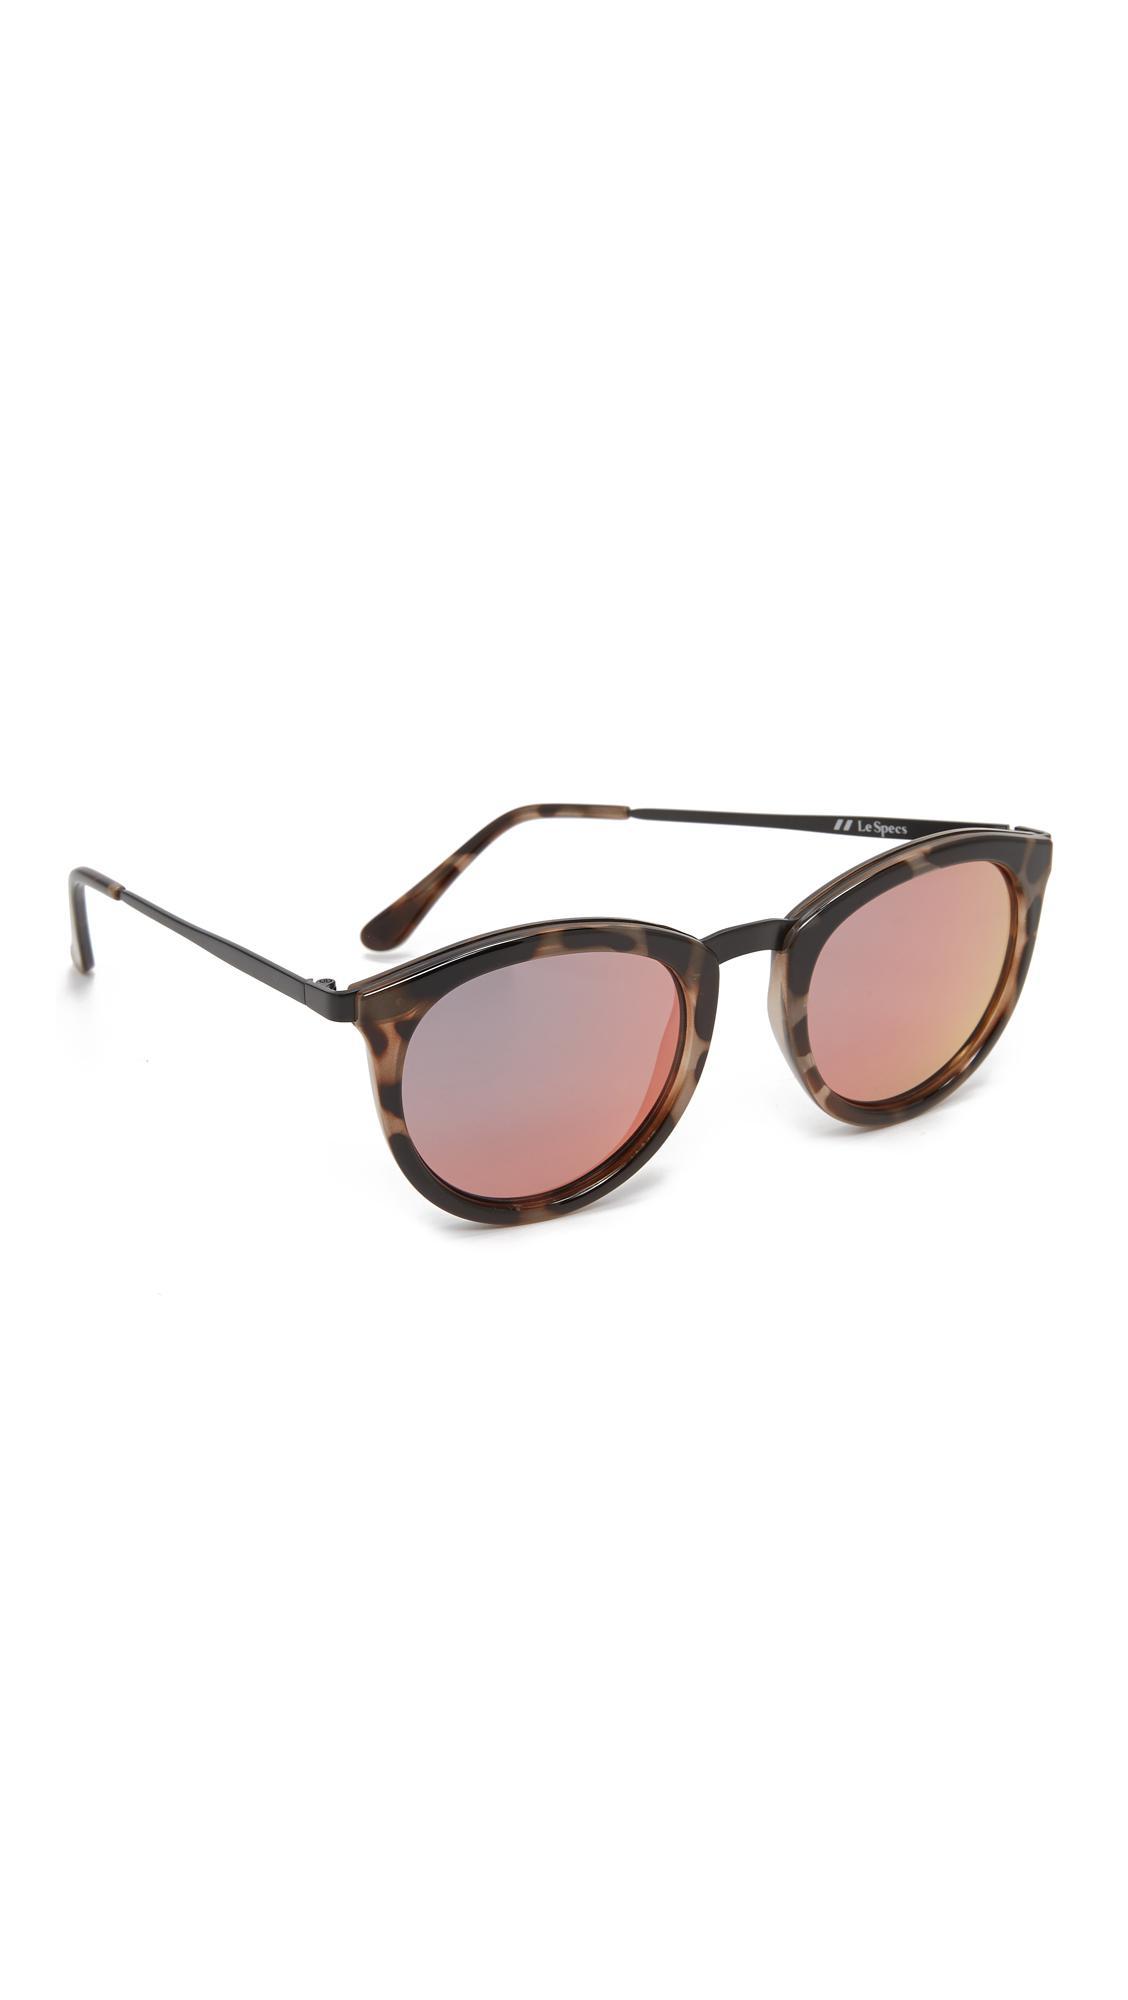 2975f06812 Le Specs - Multicolor No Smirking Sunglasses - Lyst. View fullscreen